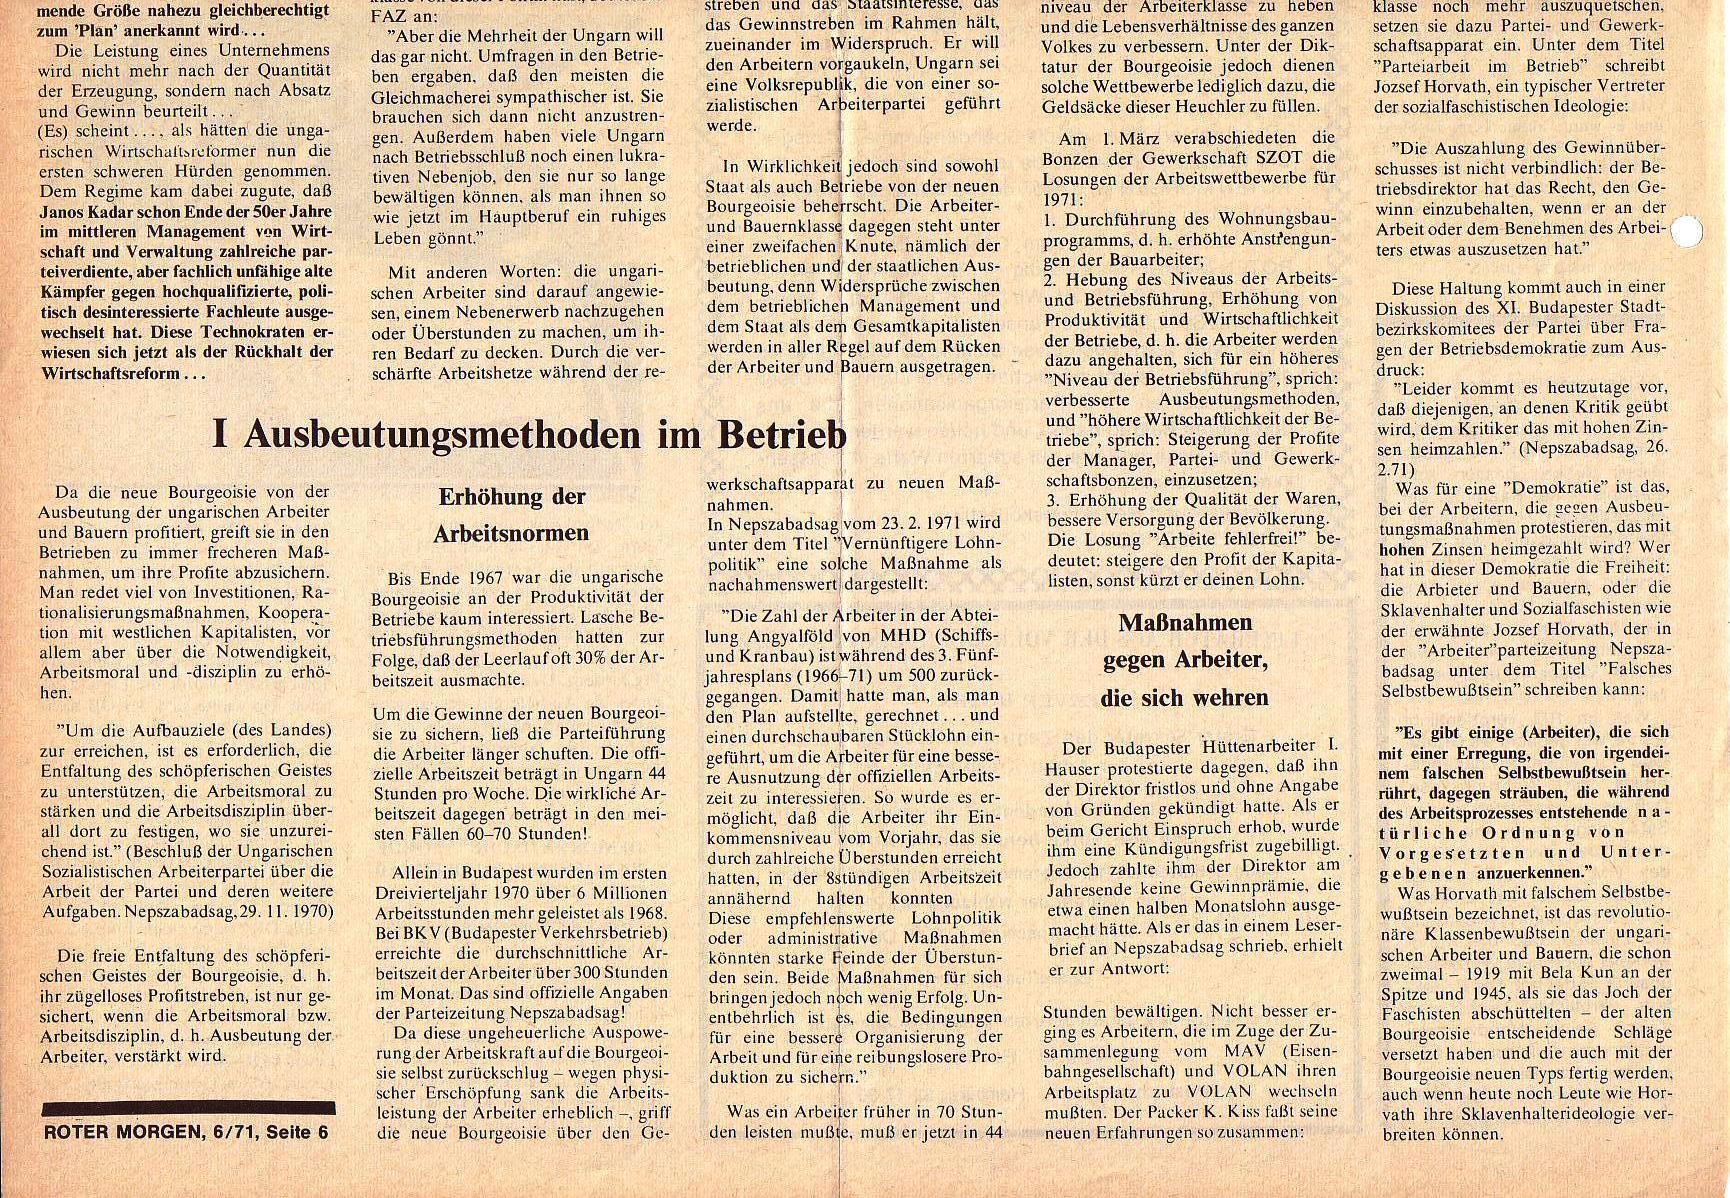 Roter Morgen, 5. Jg., Juni 1971, Nr. 6, Seite 6b